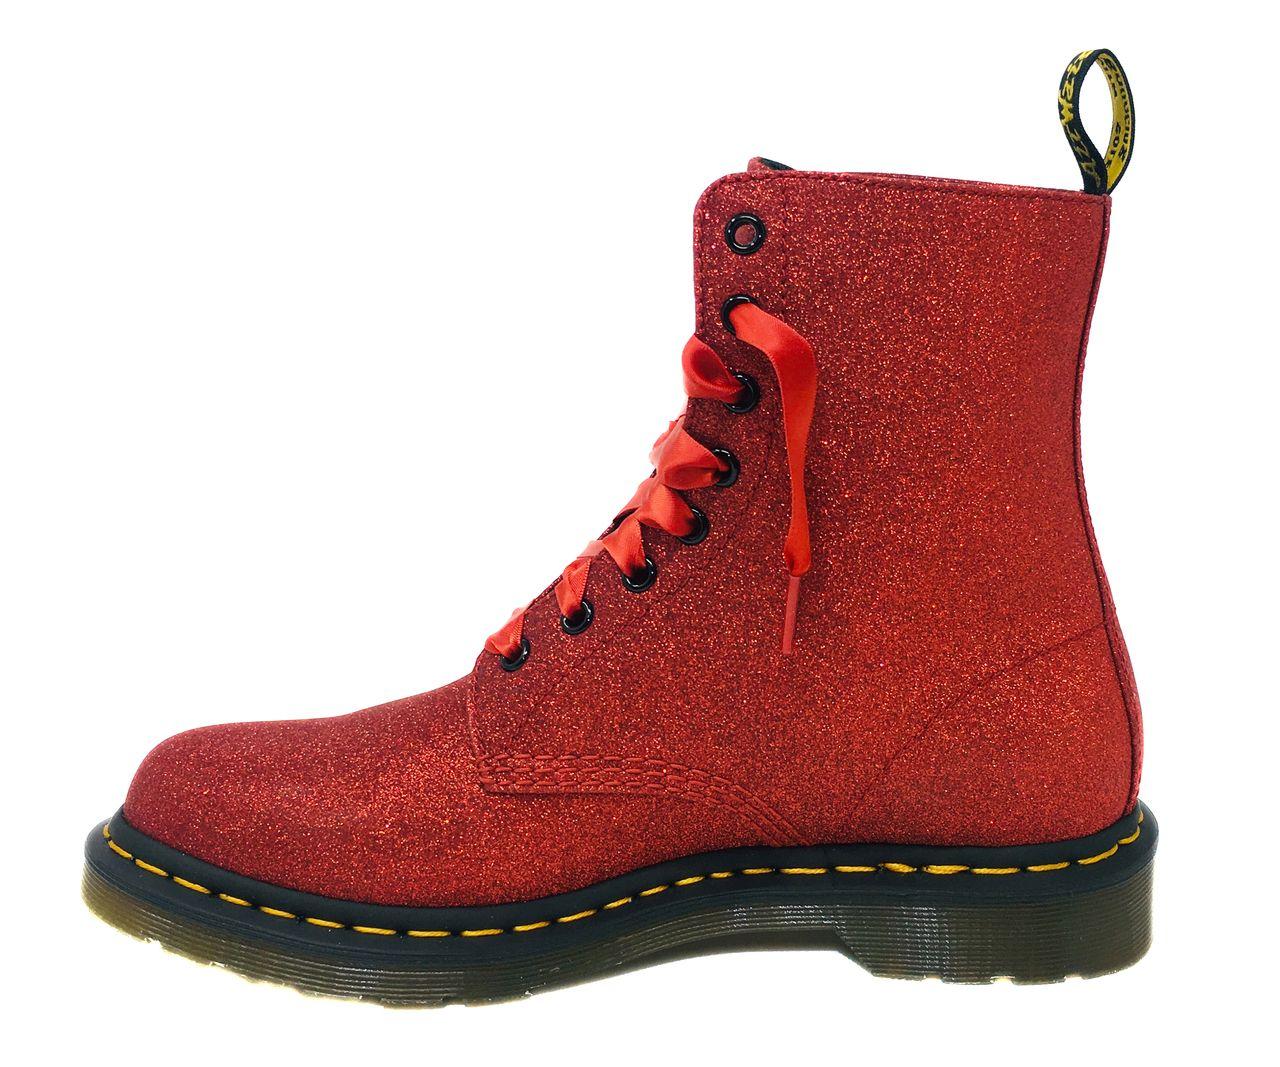 2241549ebc2b Dr. Martens Women's 1460 Pascal Glitter #24839602 Red in 2019 ...